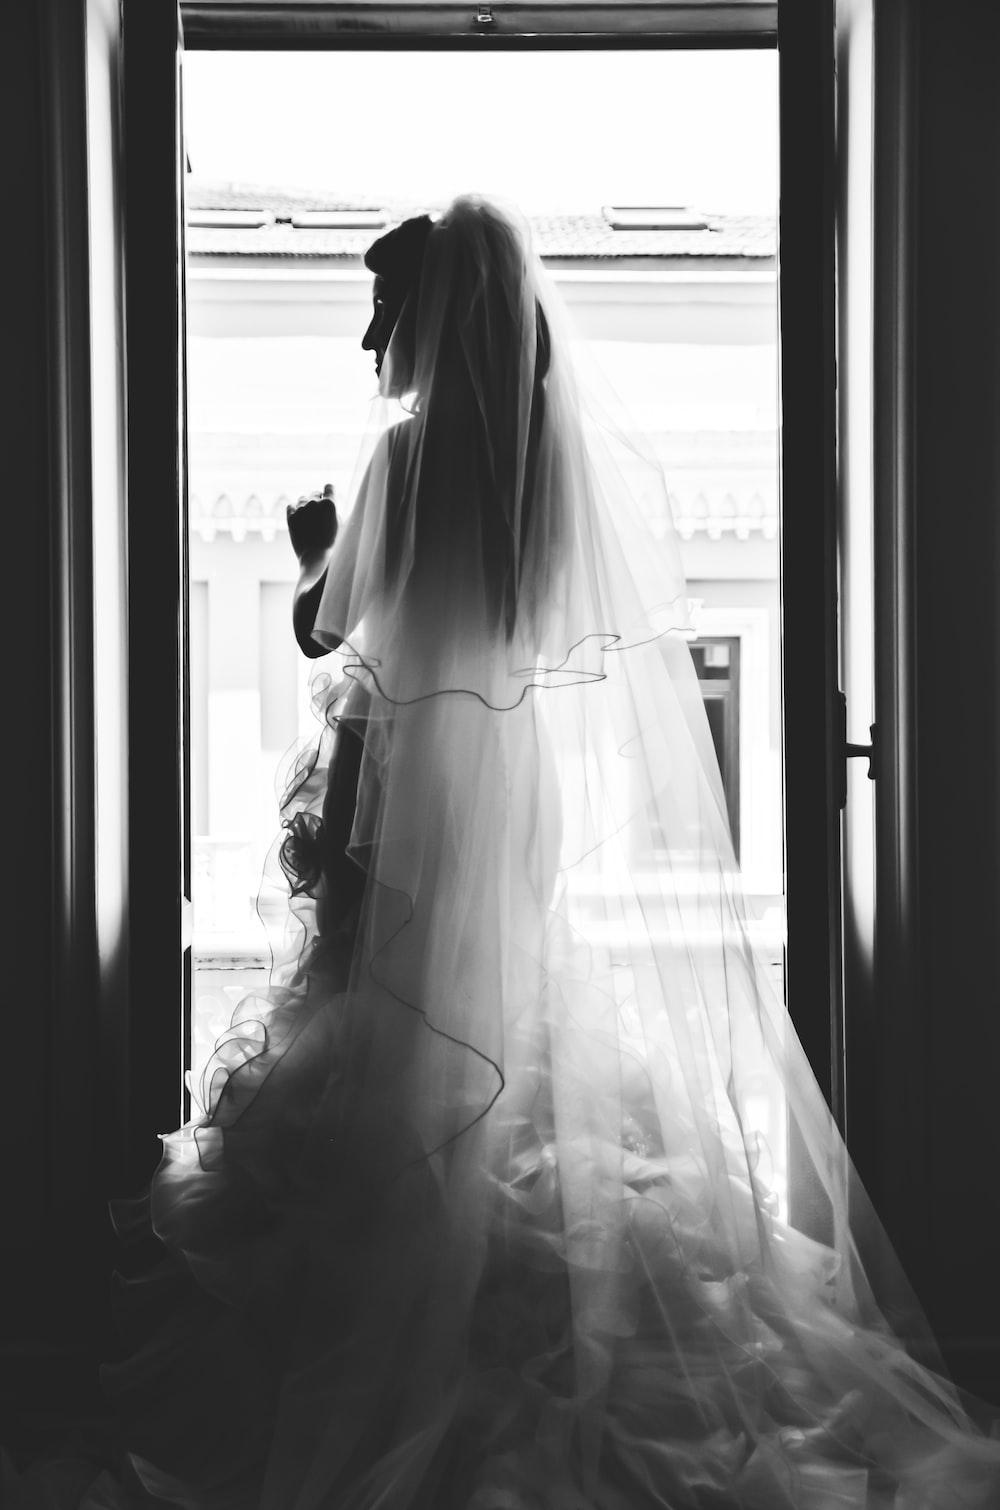 grayscale photography of woman wearing wedding dress